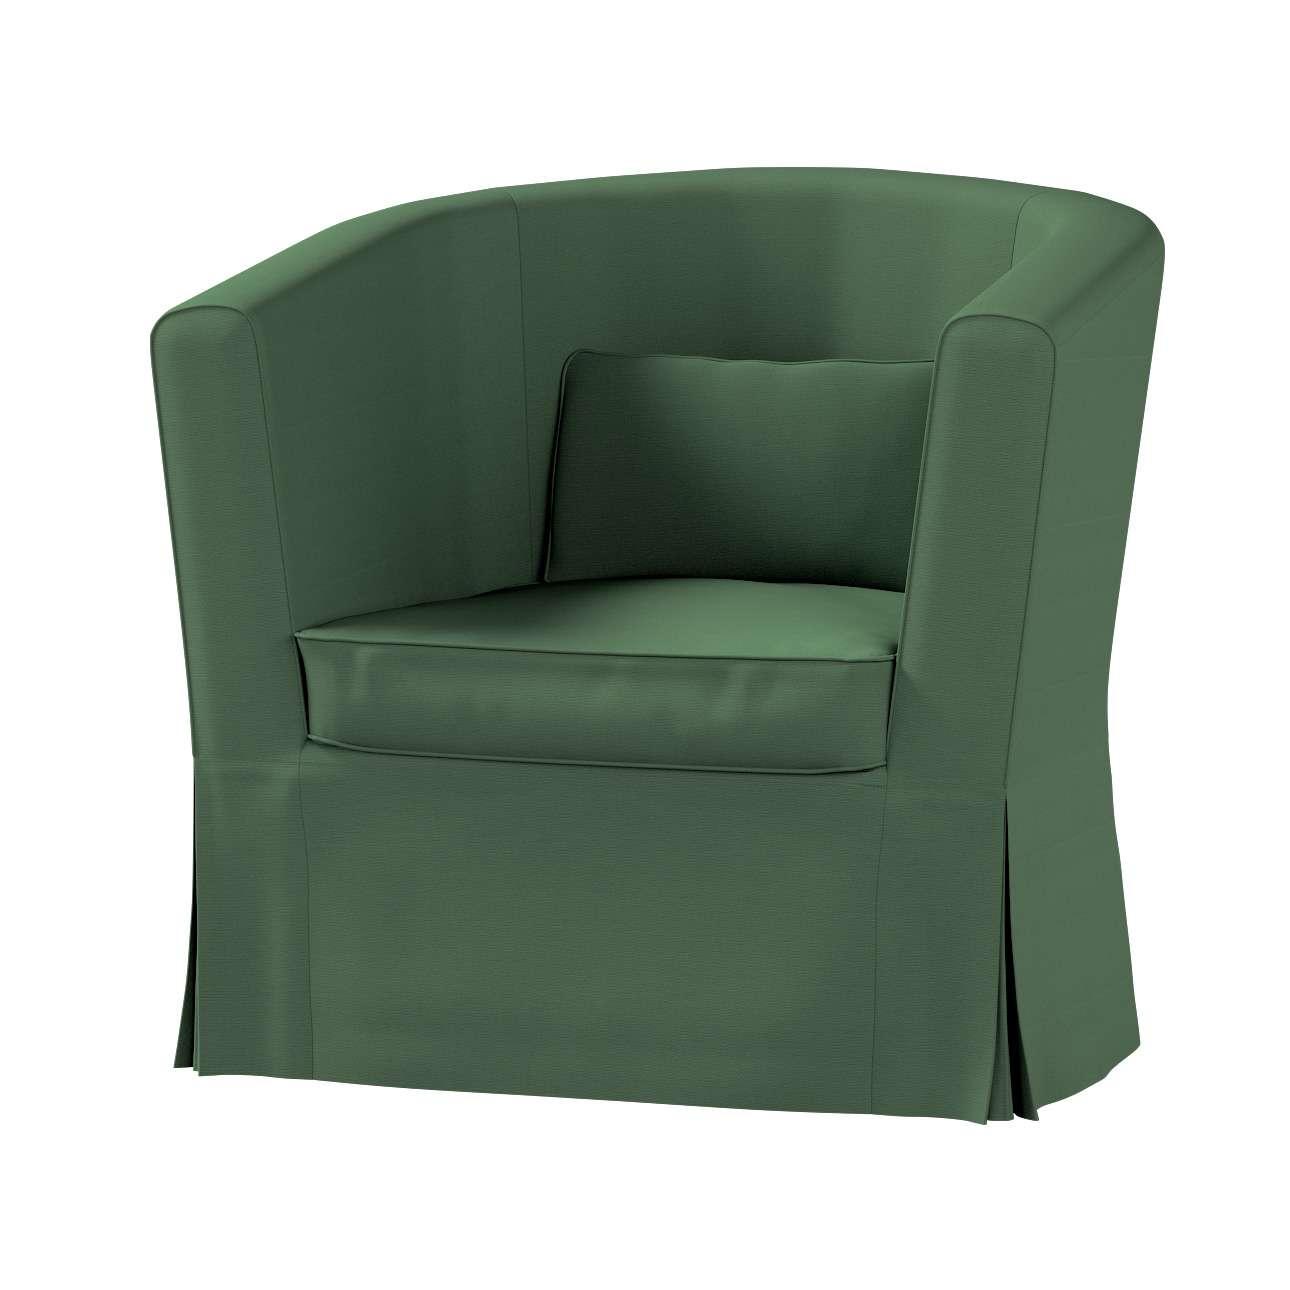 Pokrowiec na fotel Ektorp Tullsta fotel Ektorp Tullsta w kolekcji Cotton Panama, tkanina: 702-06